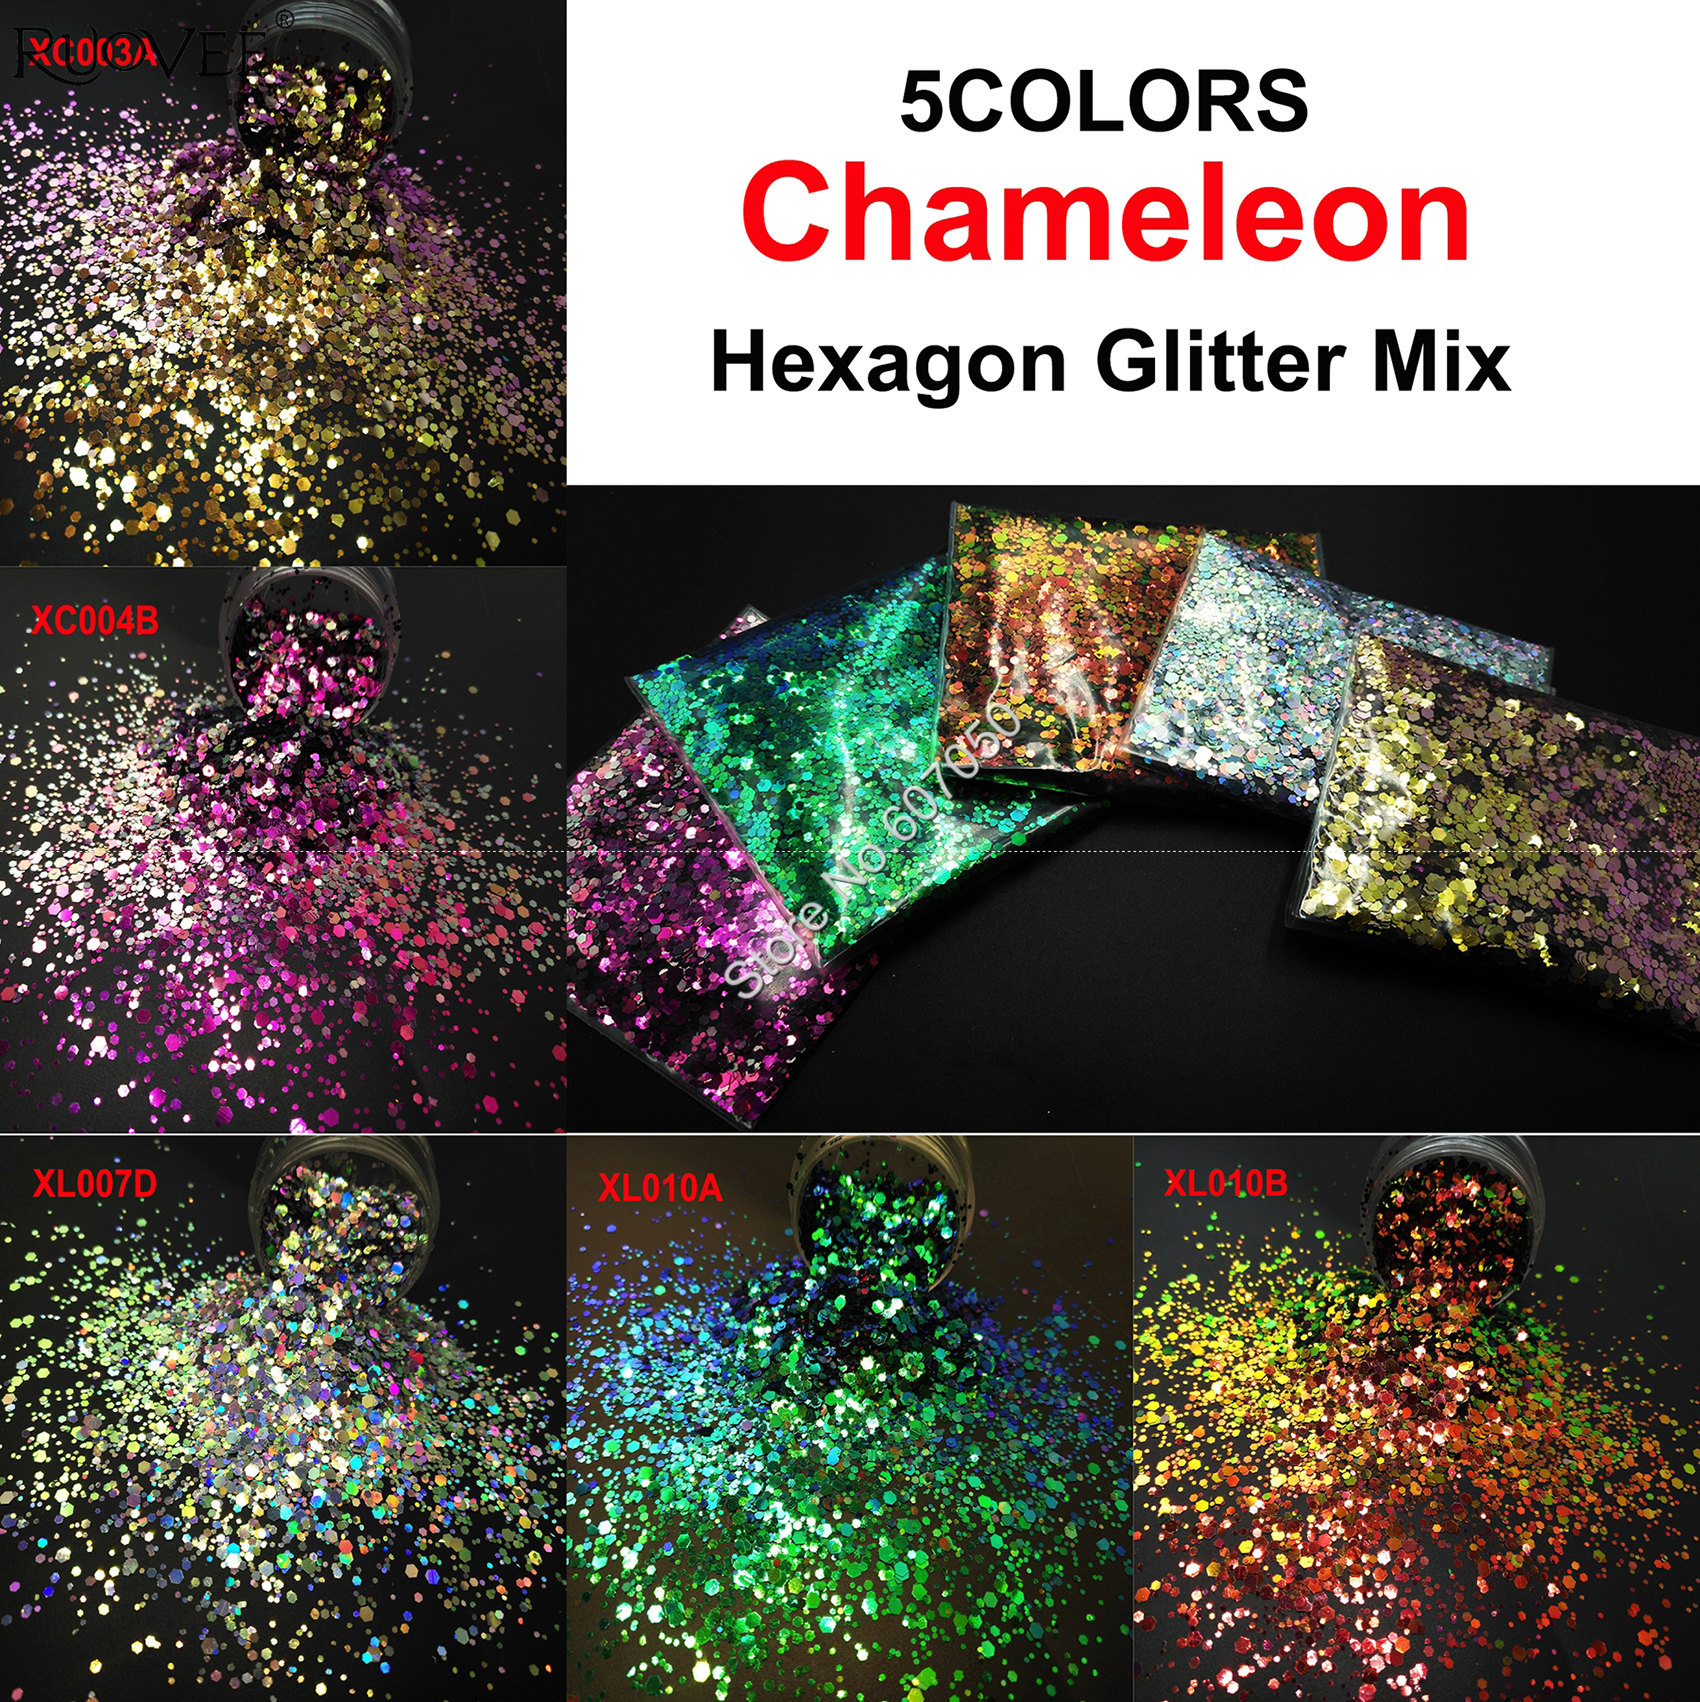 Craft-Decorations Diy-Accessories Makeup Nail-Art Chameleon Glitter Hexagon-Shape Metallic